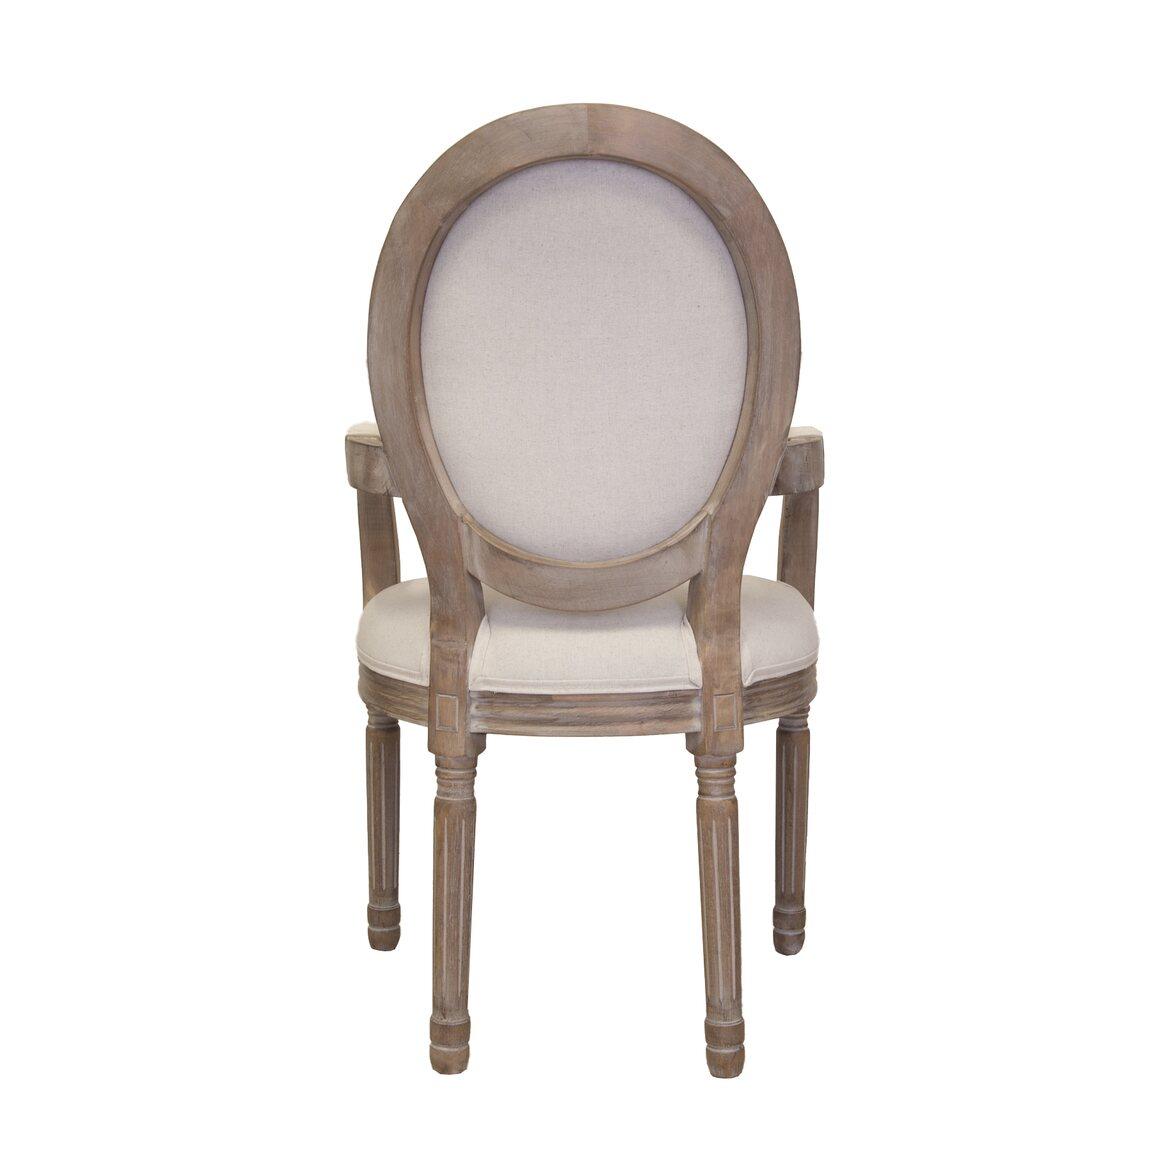 Стул Volker arm beige 3 | Обеденные стулья Kingsby